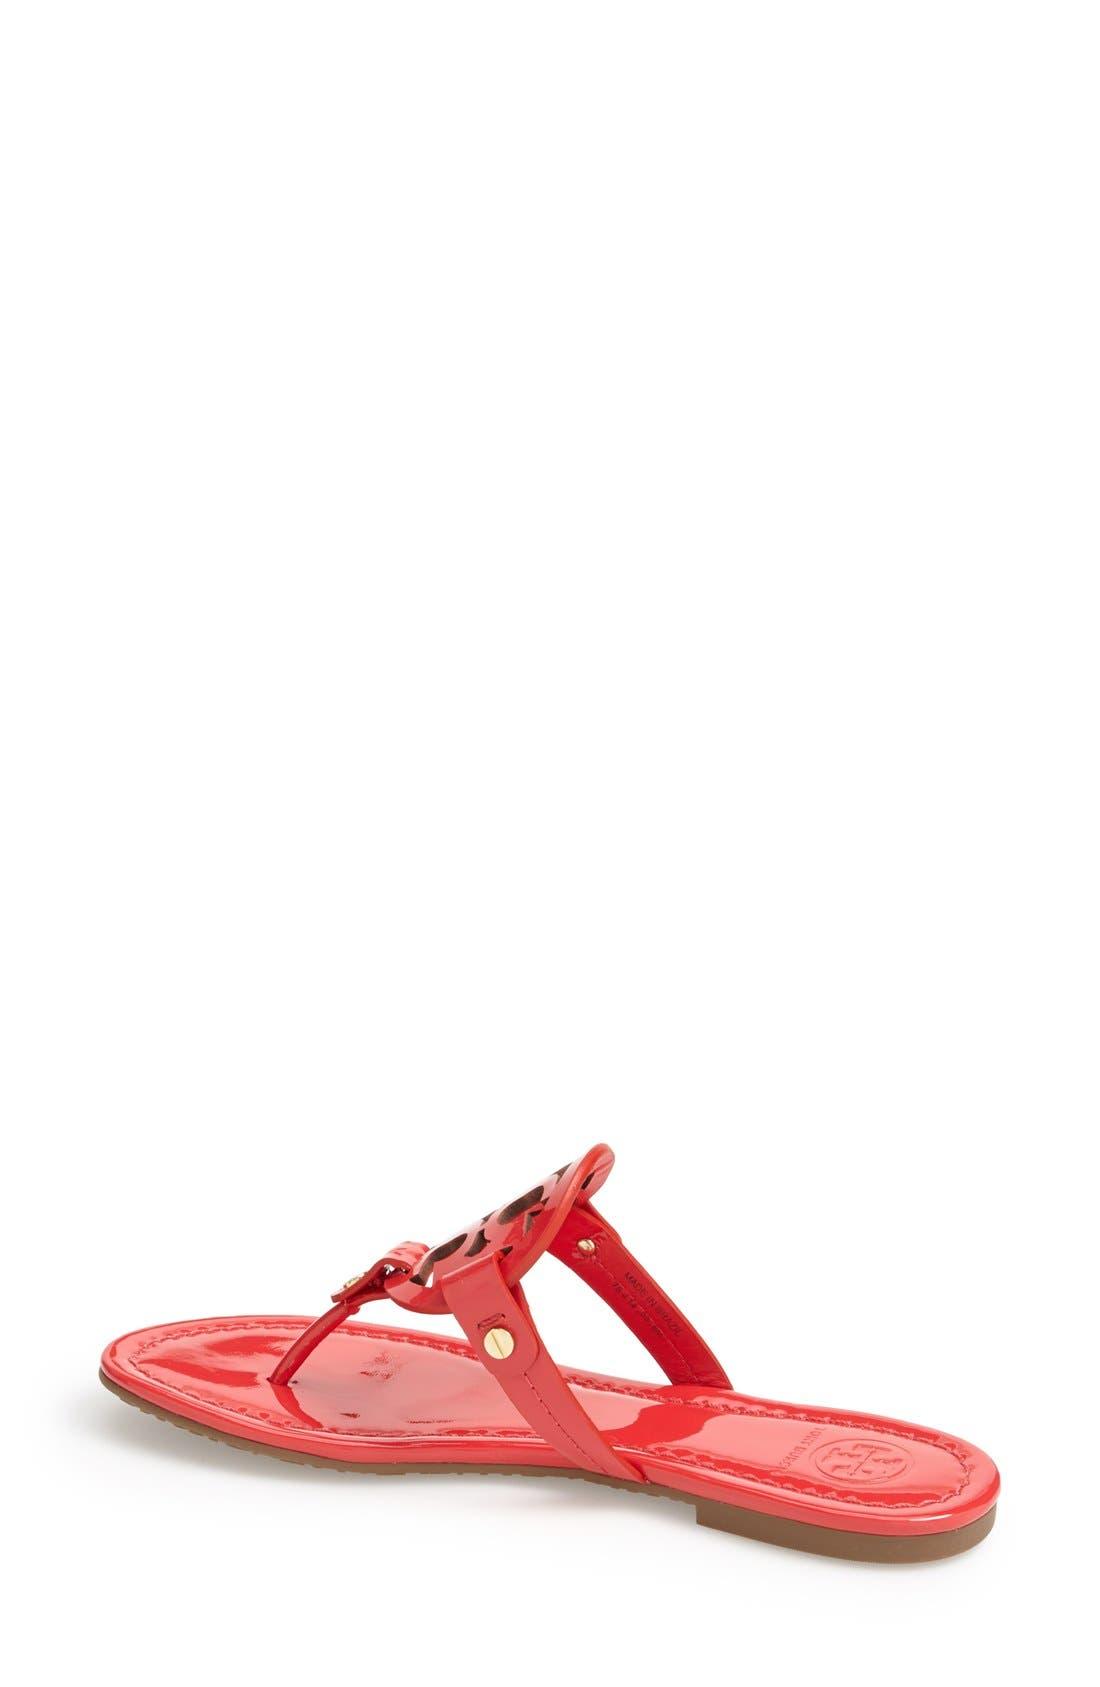 Alternate Image 2  - Tory Burch 'Miller' Sandal (Women) (Nordstrom Exclusive)